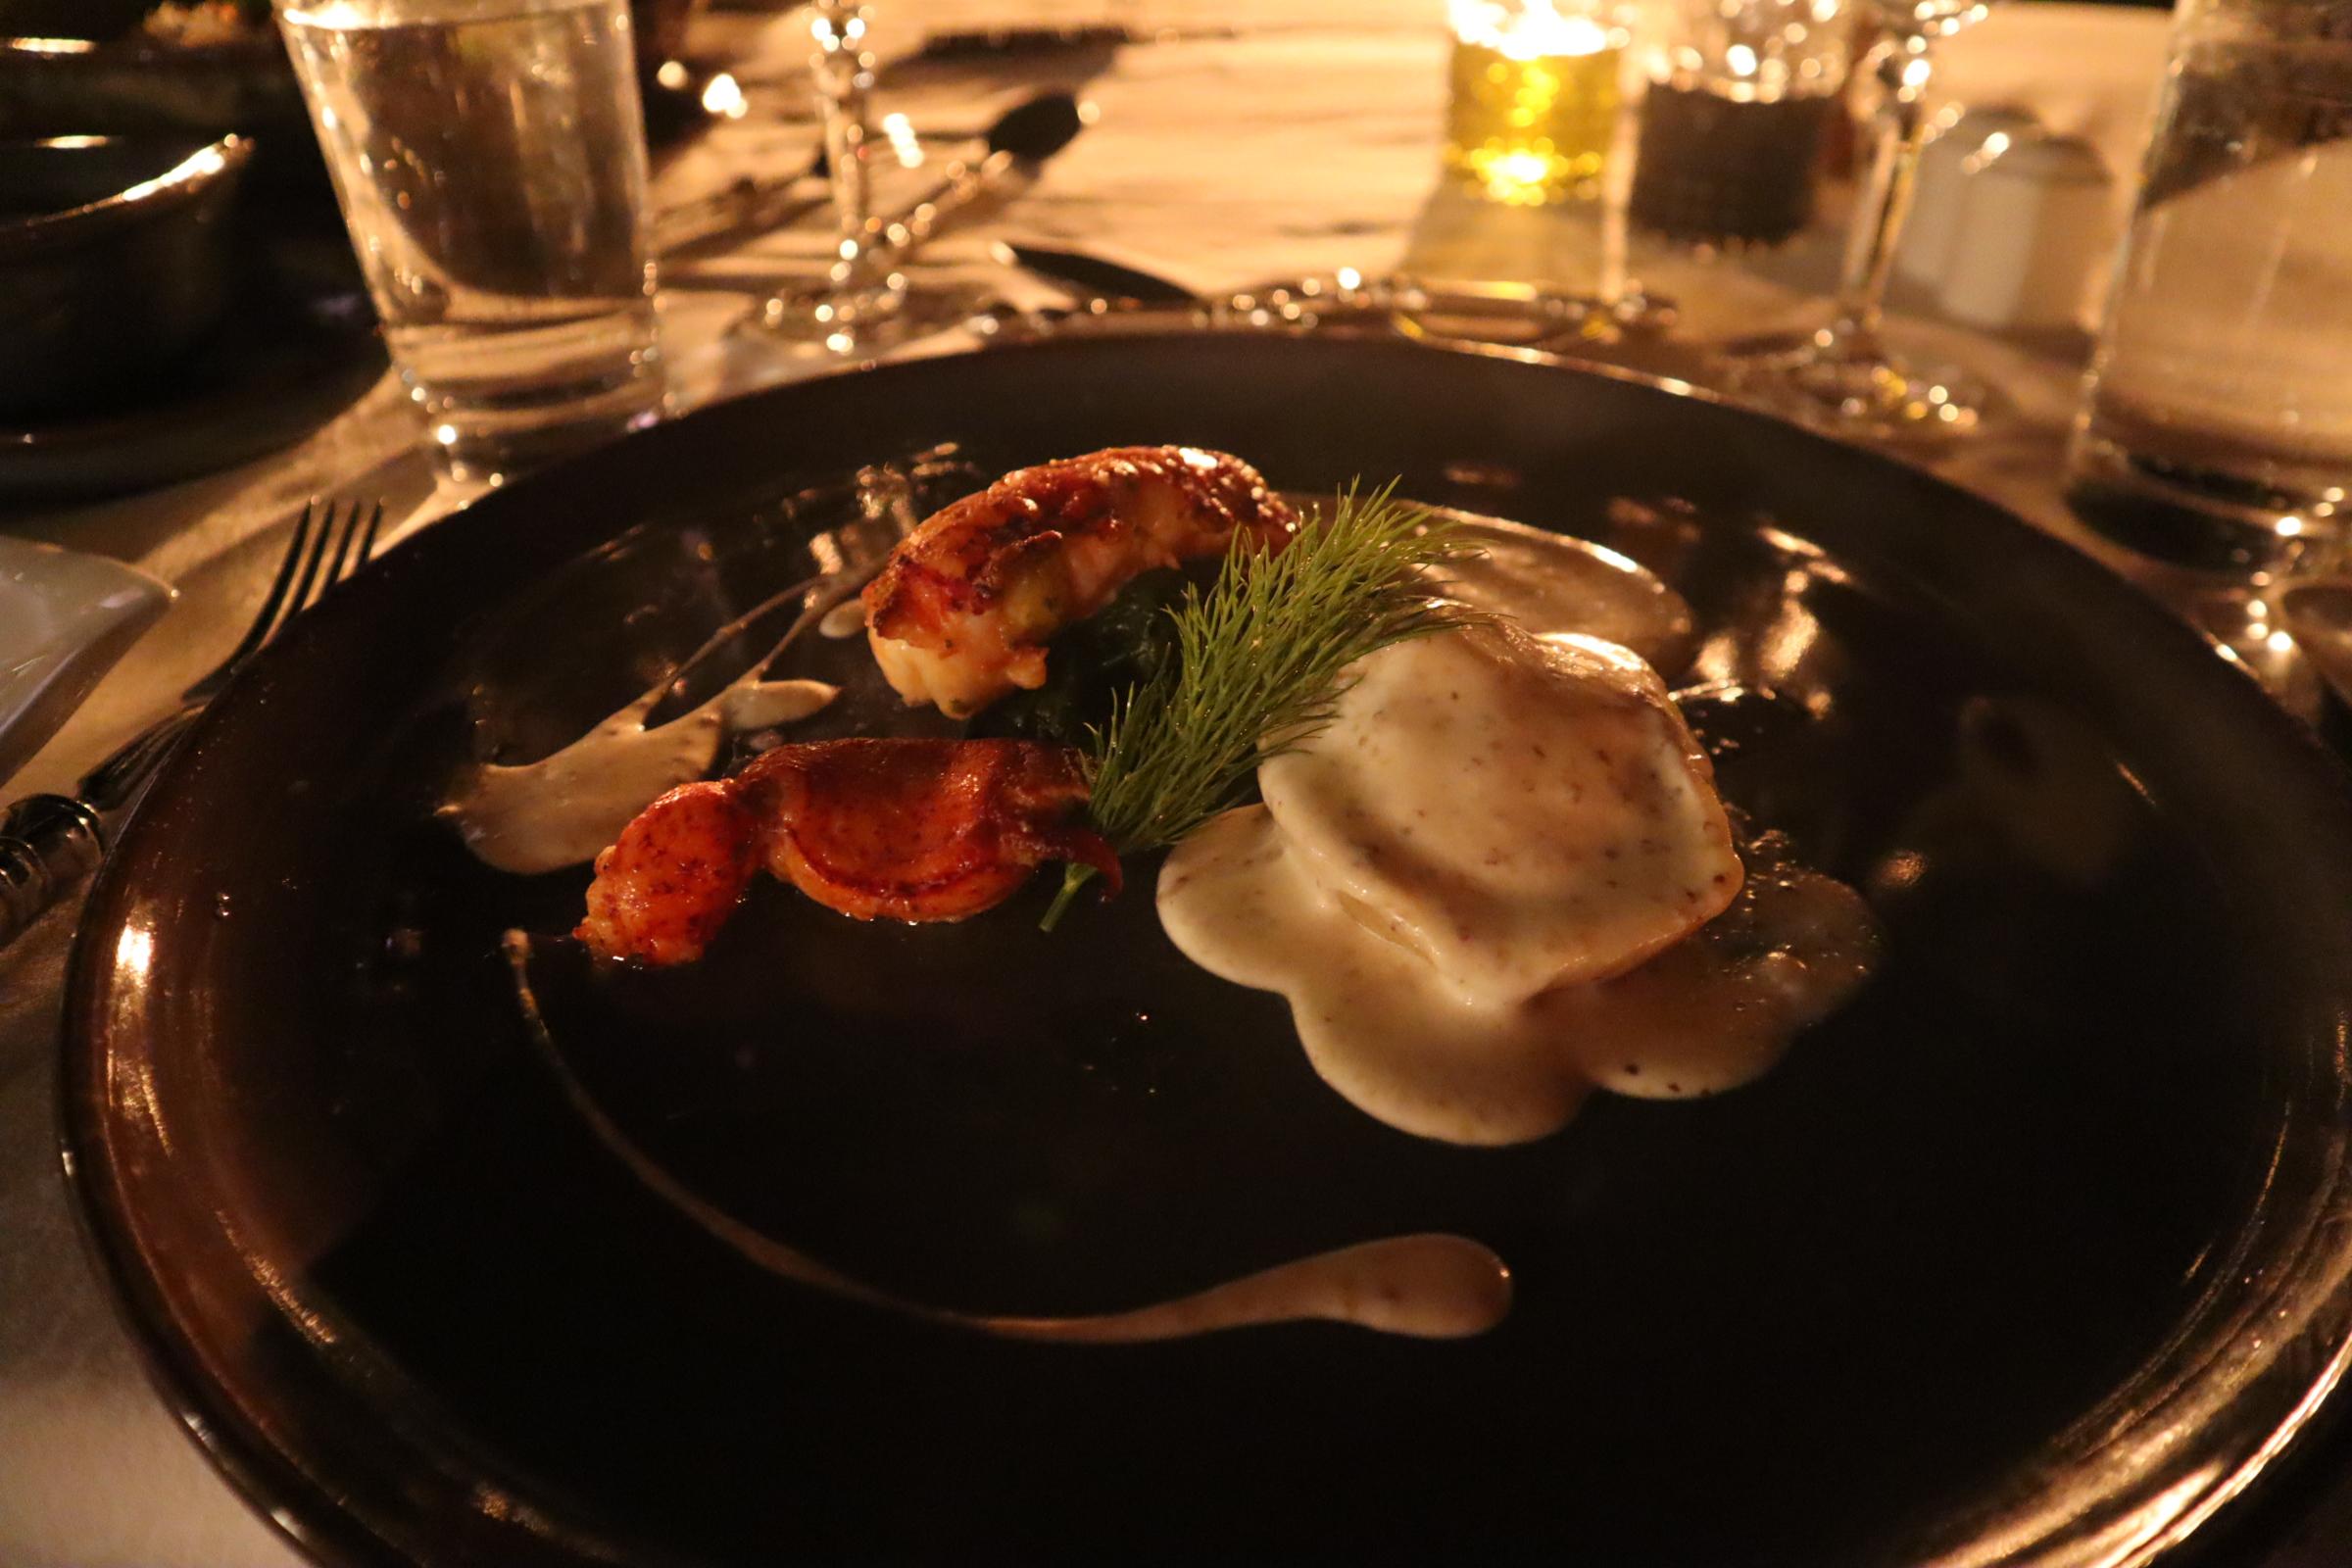 Grilled lobster for dinner at Al Maha